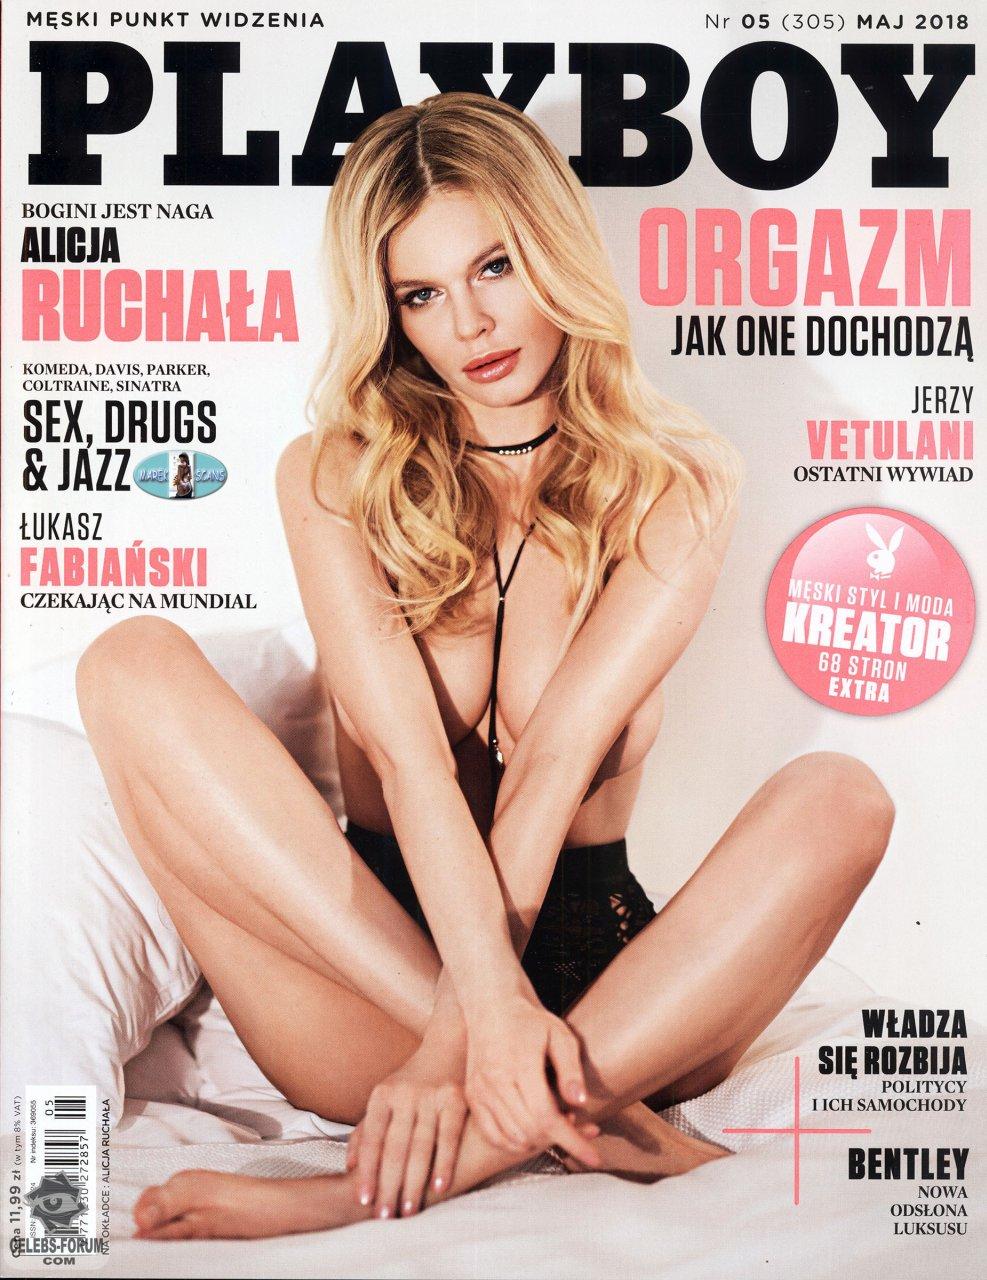 Alicija Ruchala Nude Photos and Videos new pics